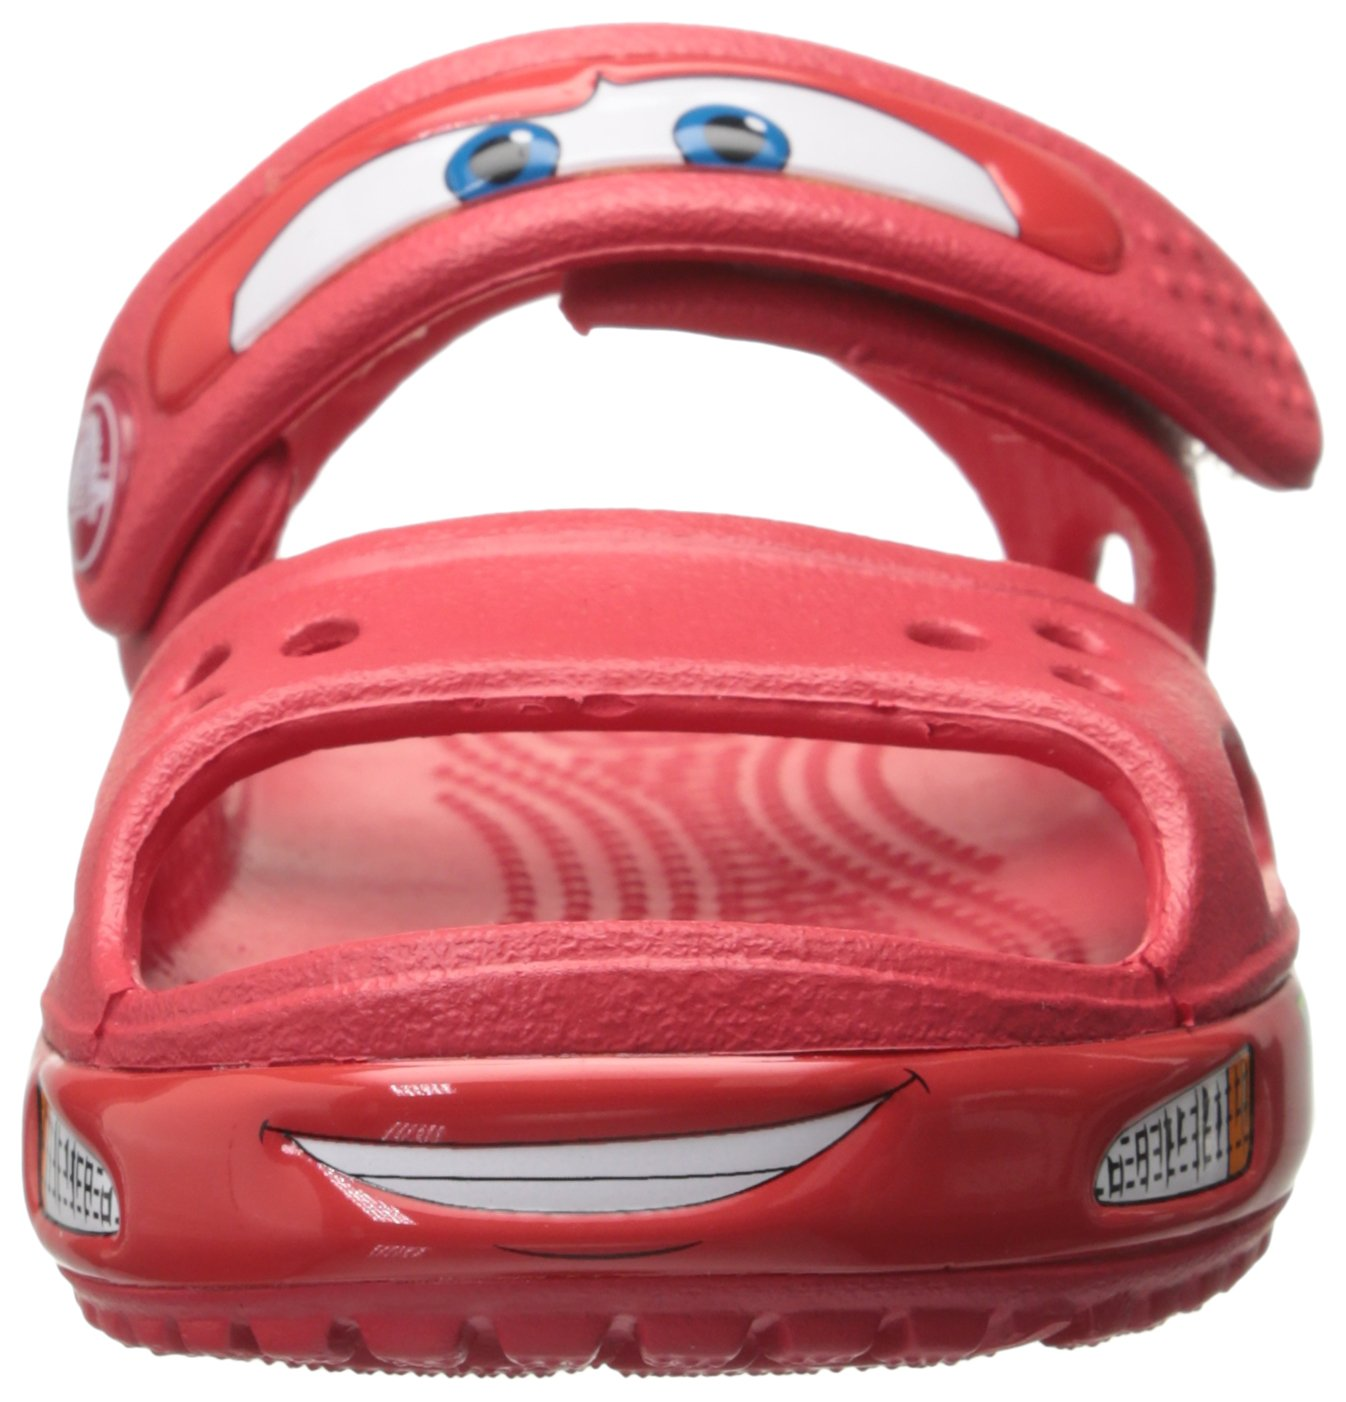 Crocs Crocband II Cars Sandal (Toddler/Little Kid), Red, 6 M US Toddler by Crocs (Image #4)